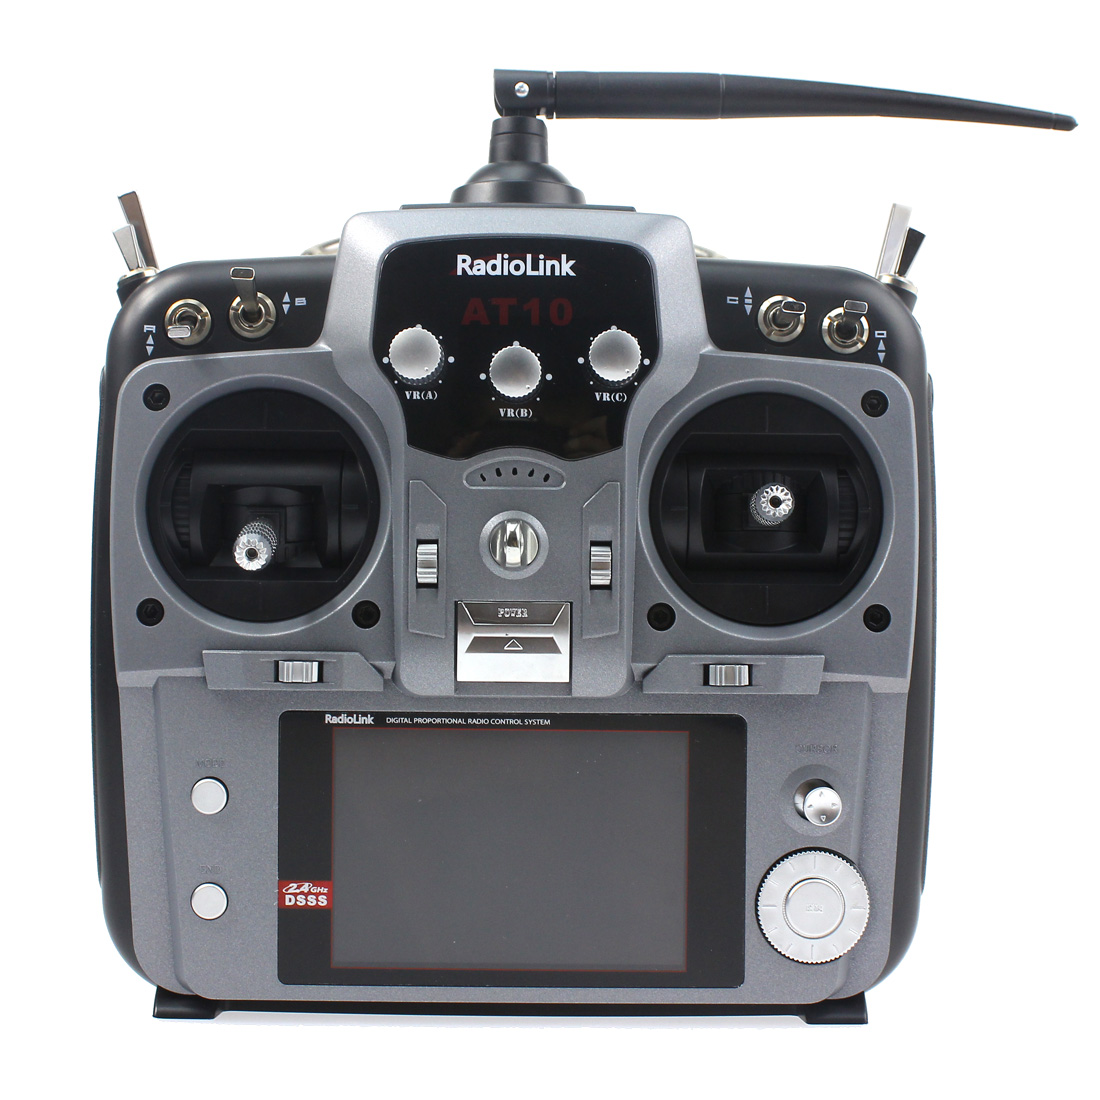 JMT DIY FPV Drone 6-axle Hexacopter Kit HMF S550 Frame PXI PX4 Flight Control 920KV Motor GPS Gimbal AT10 Transmitter